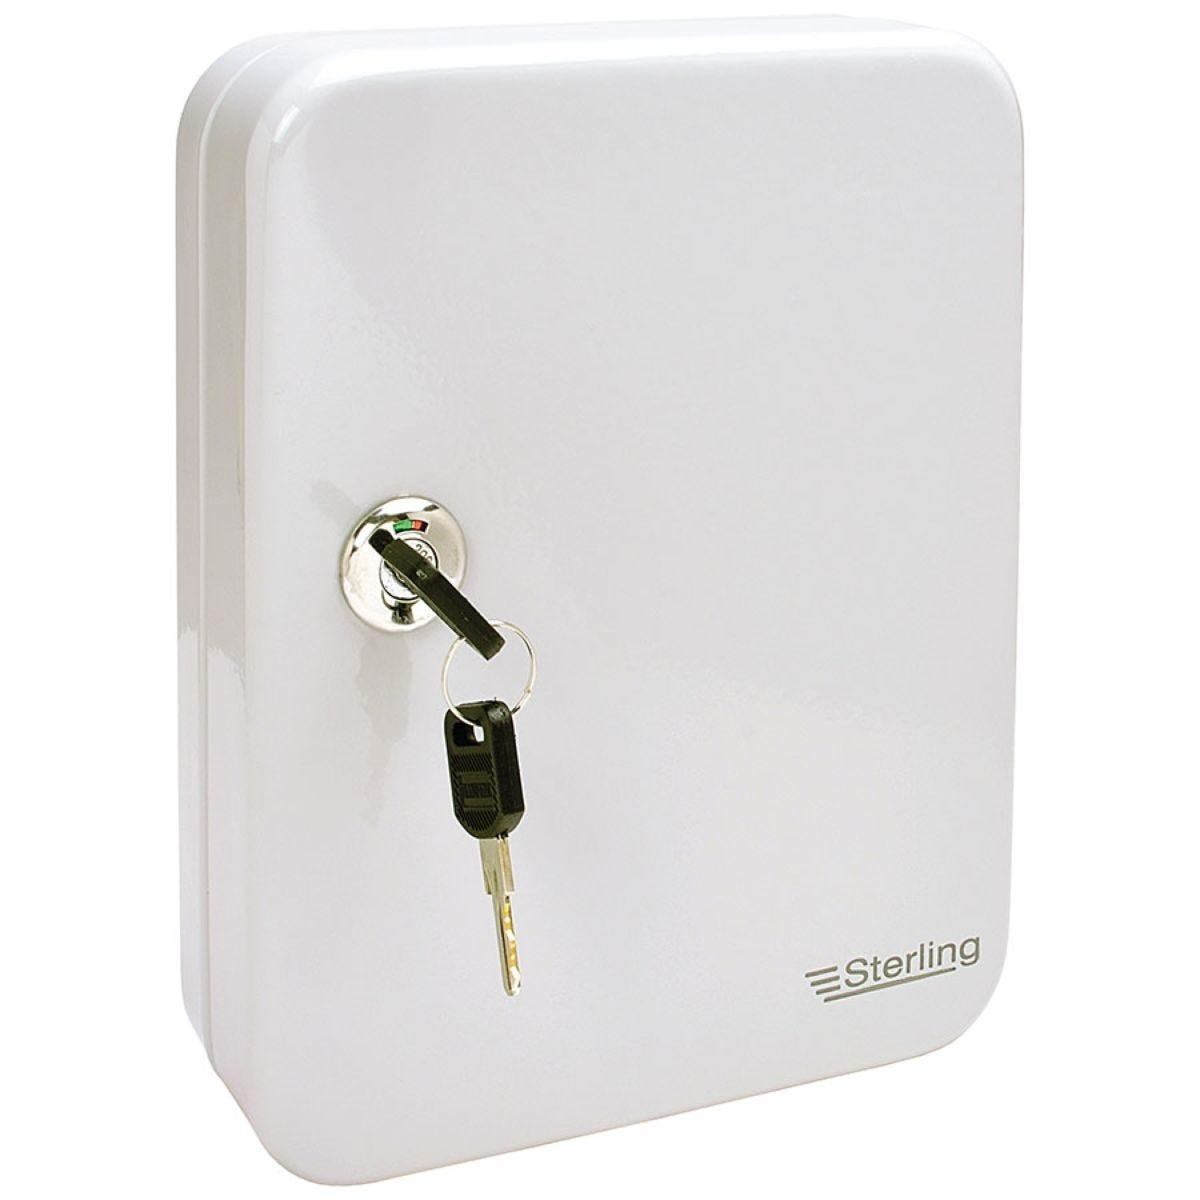 Sterling Key Locking Key Cabinet - 15 keys